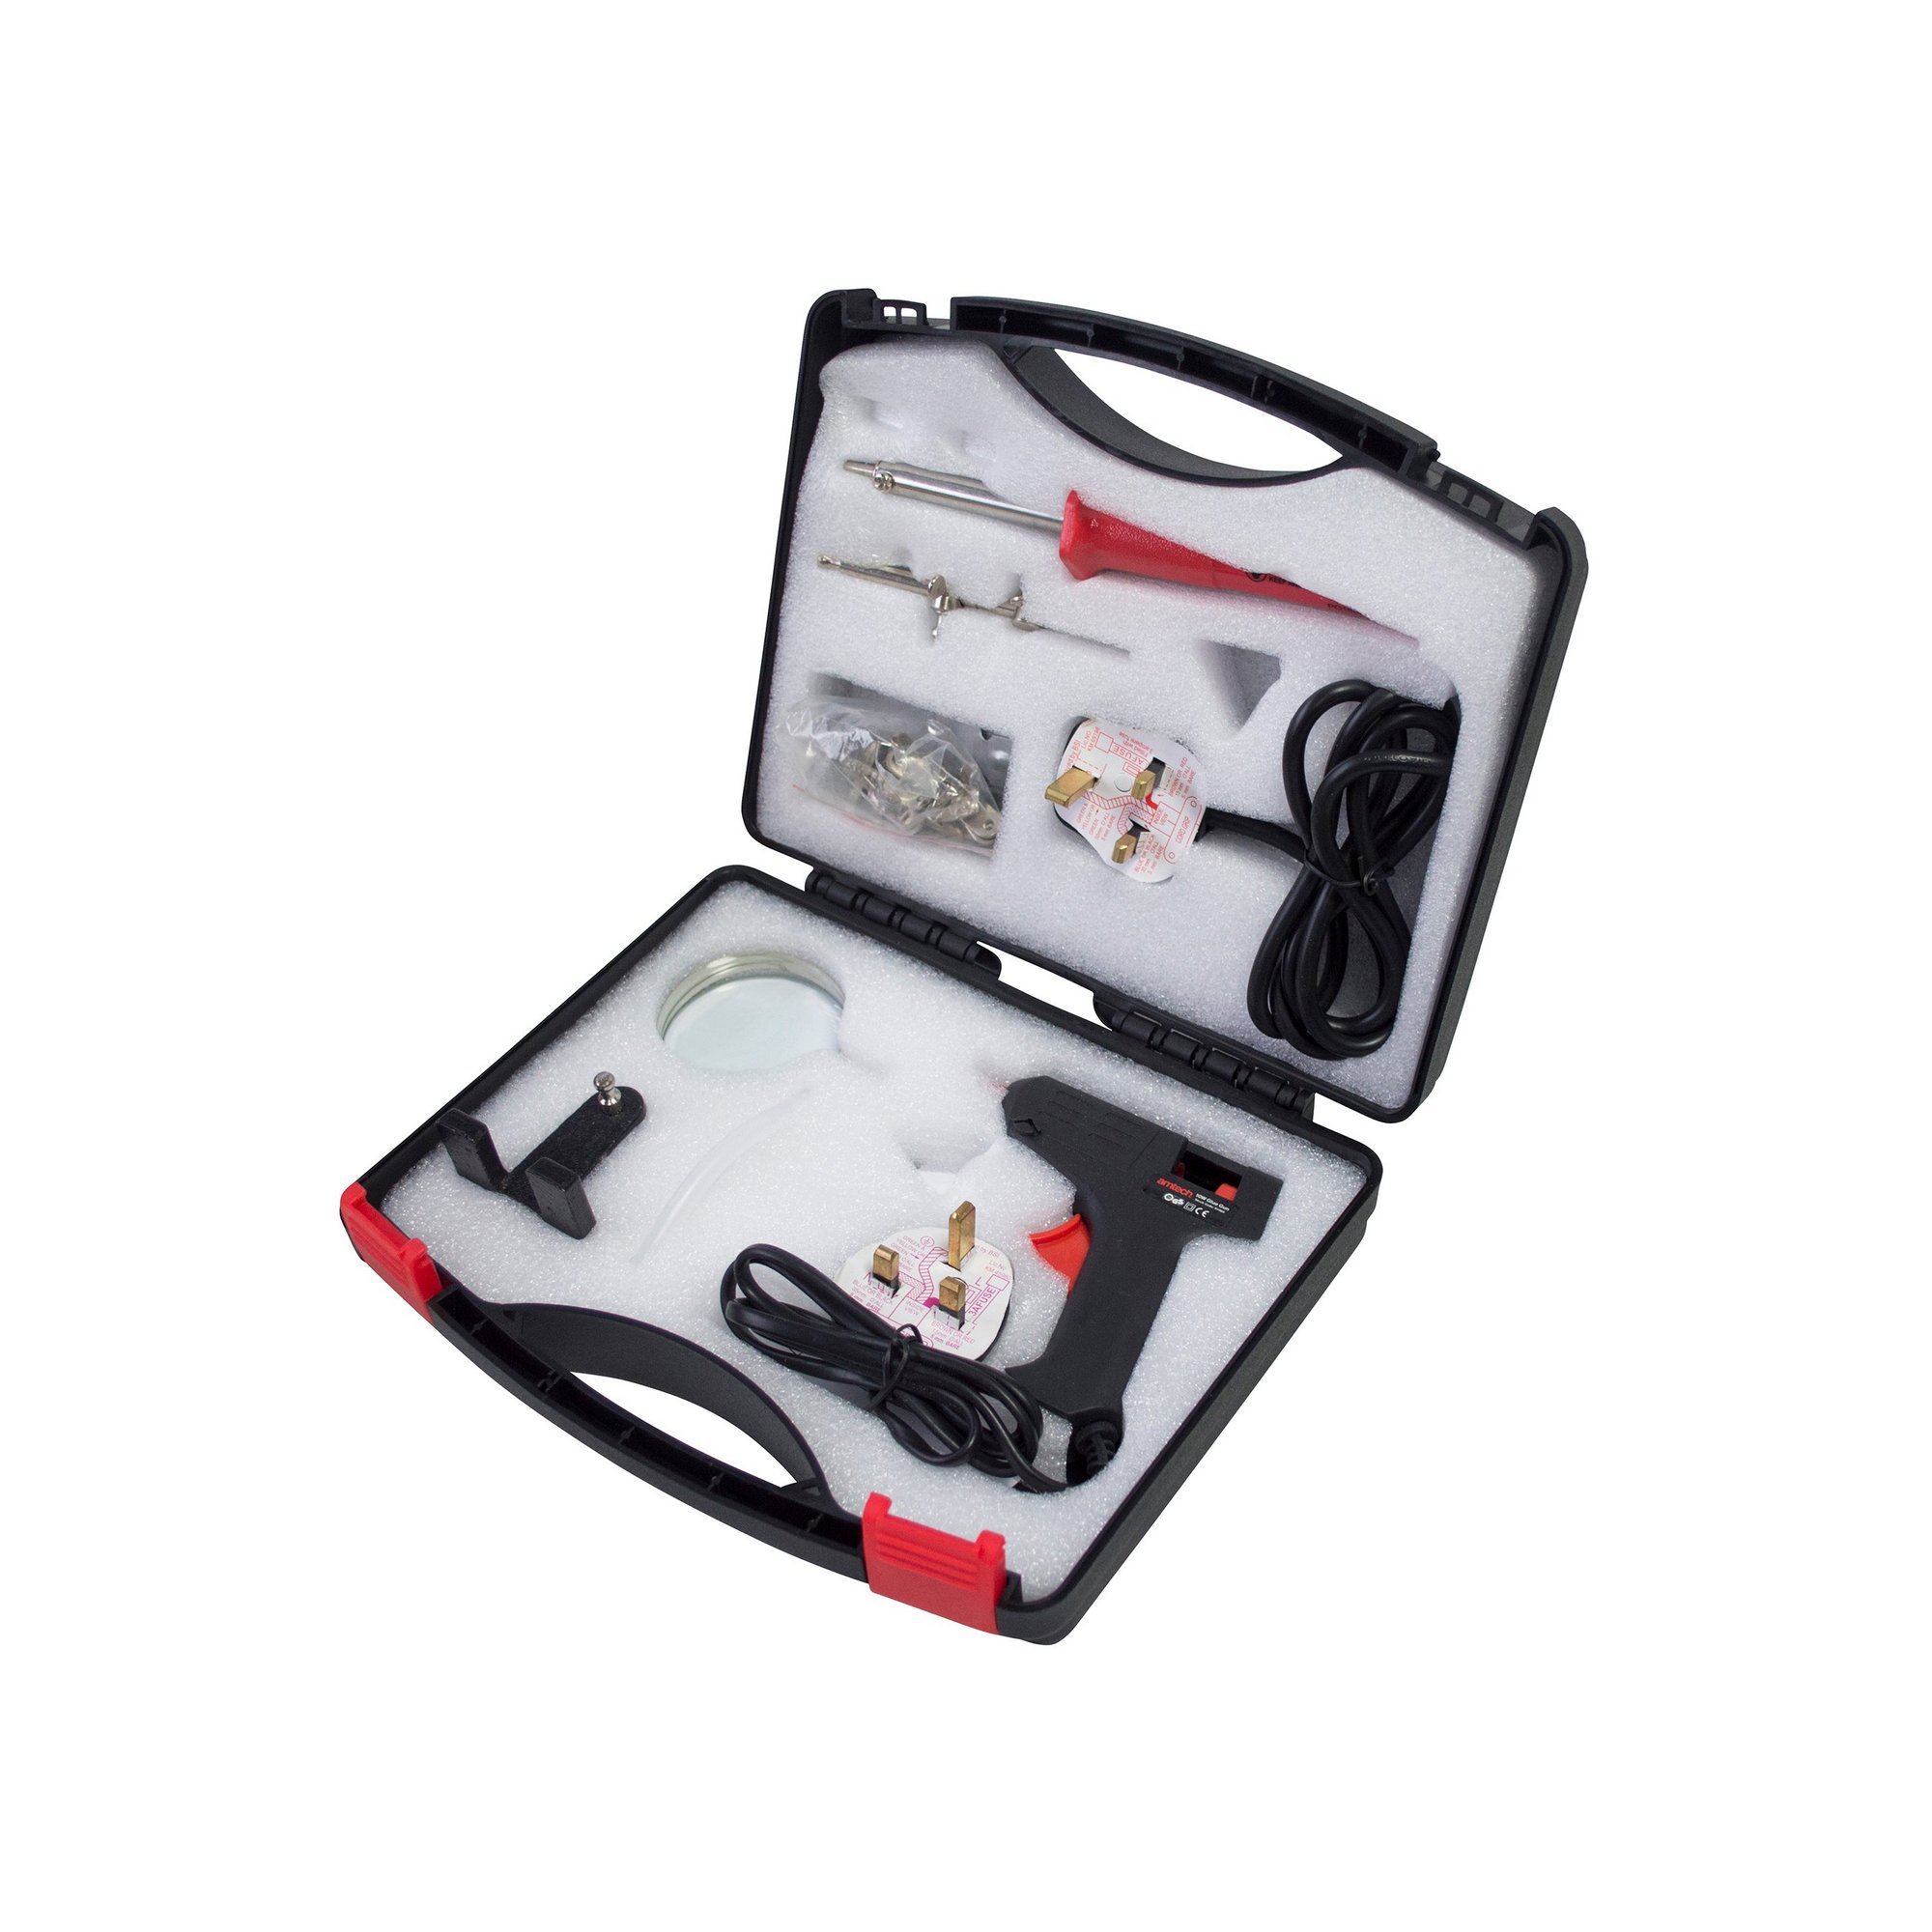 Image of Soldering Tool Kit